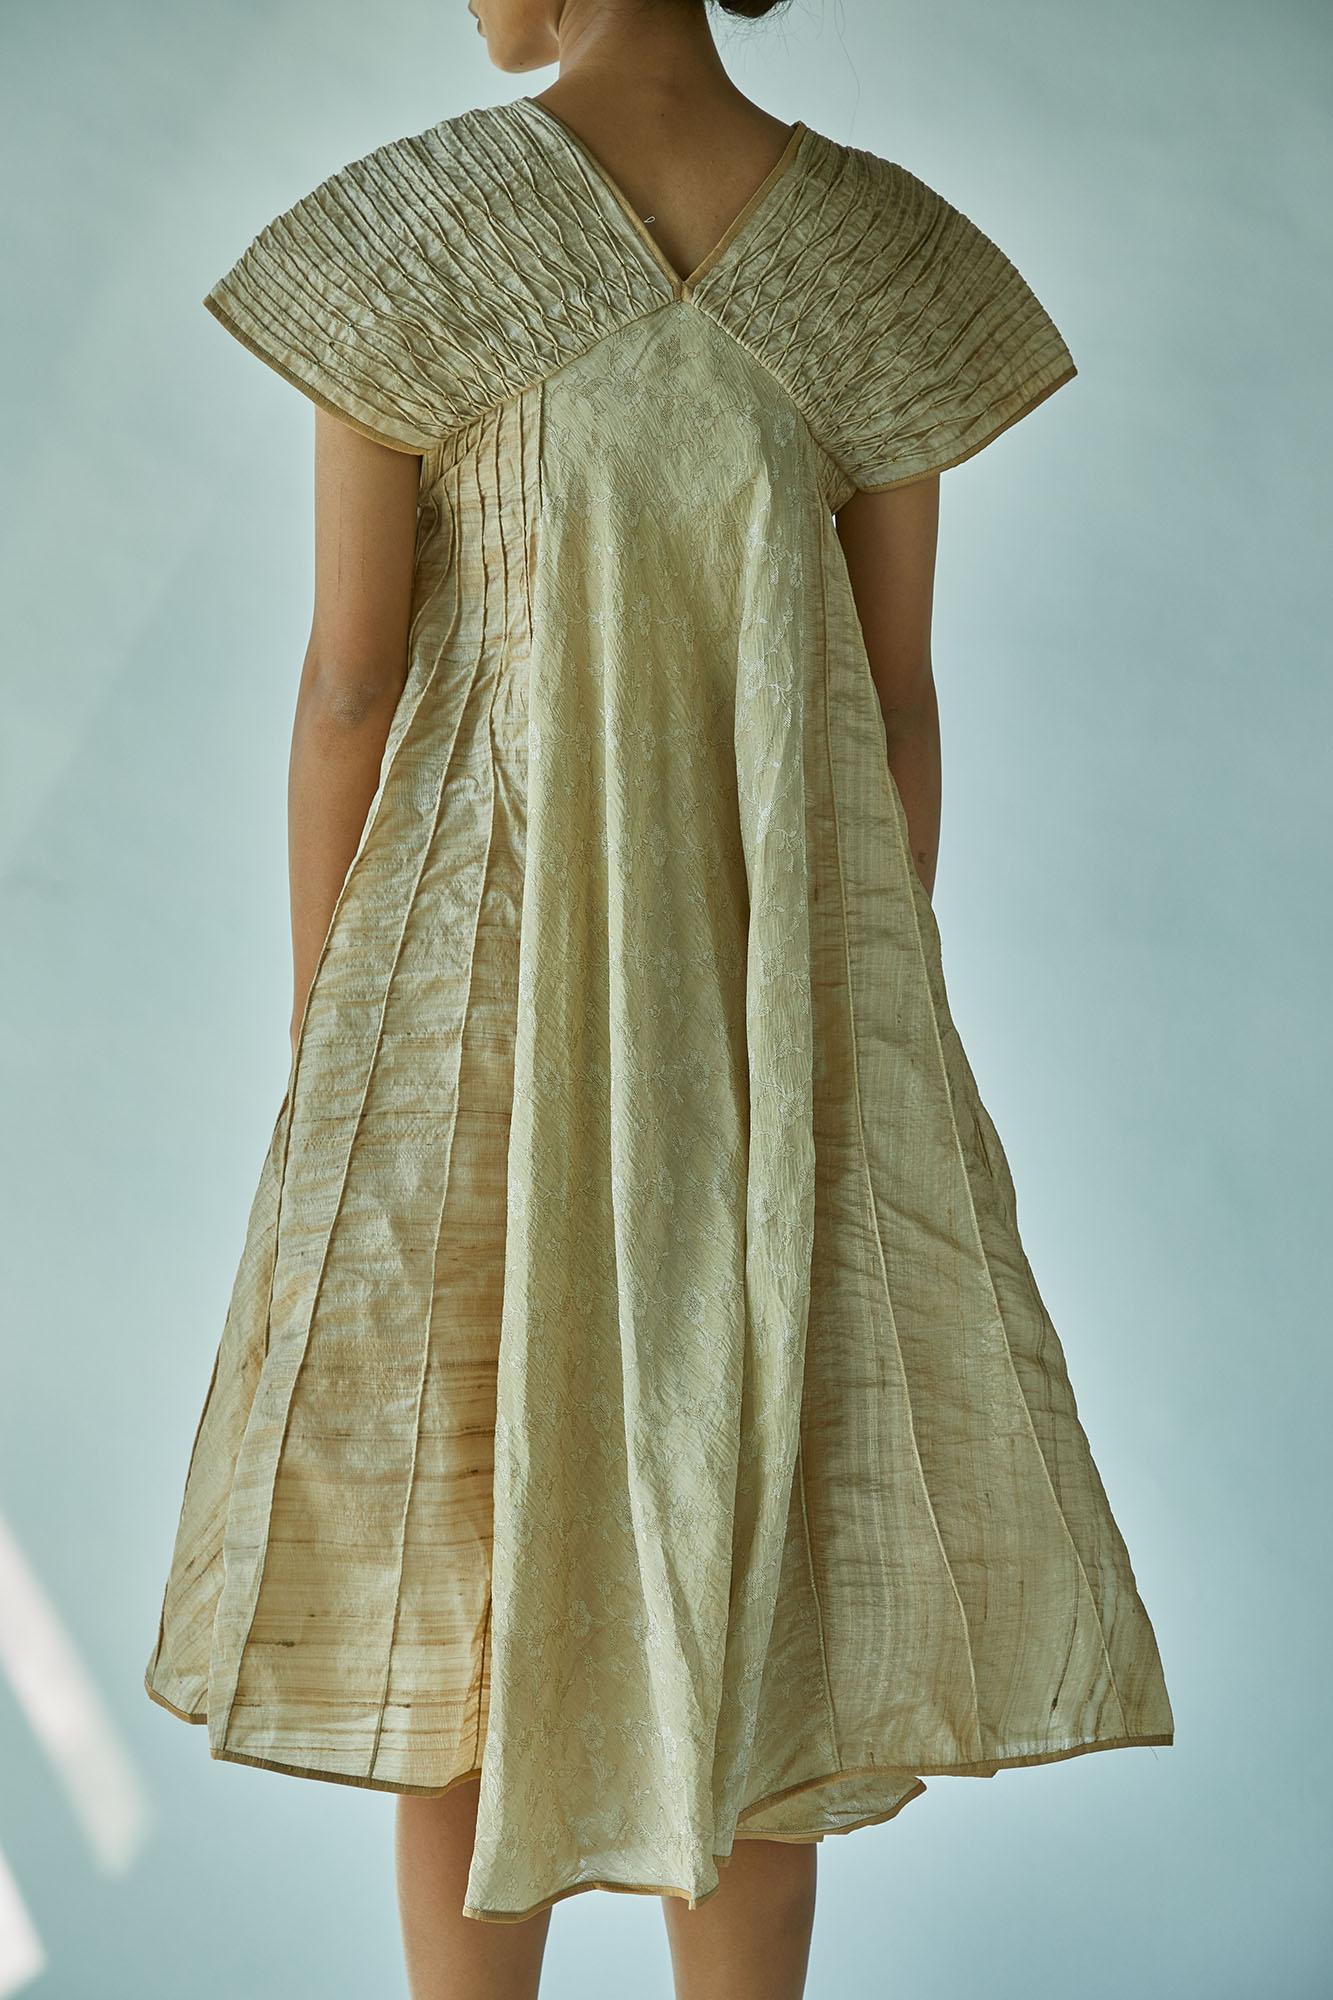 TASSAR SILK BEADED YOKE DRESS